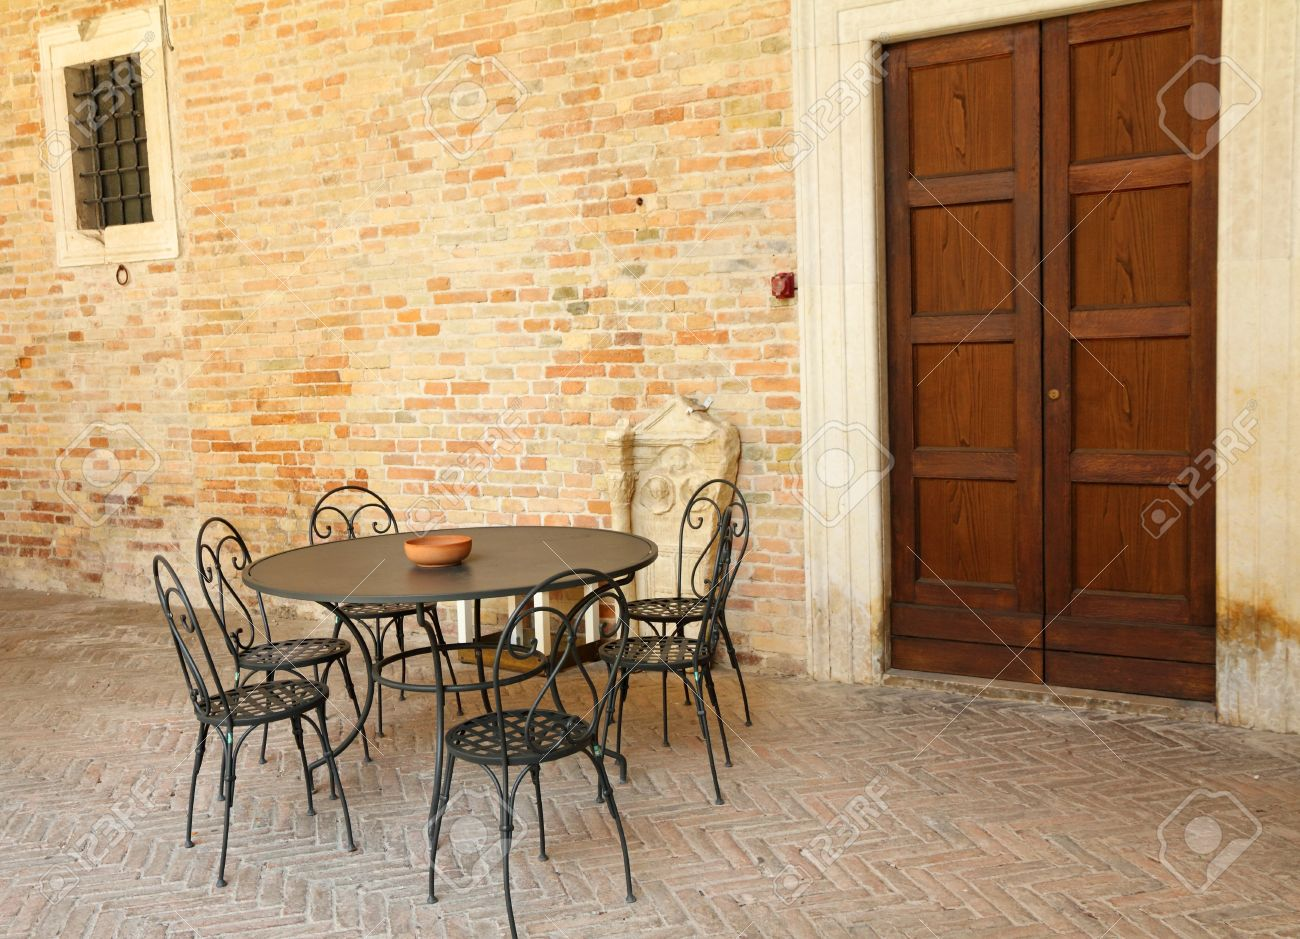 Meubles de jardin sur la terrasse rétro italien, Italie, Europe